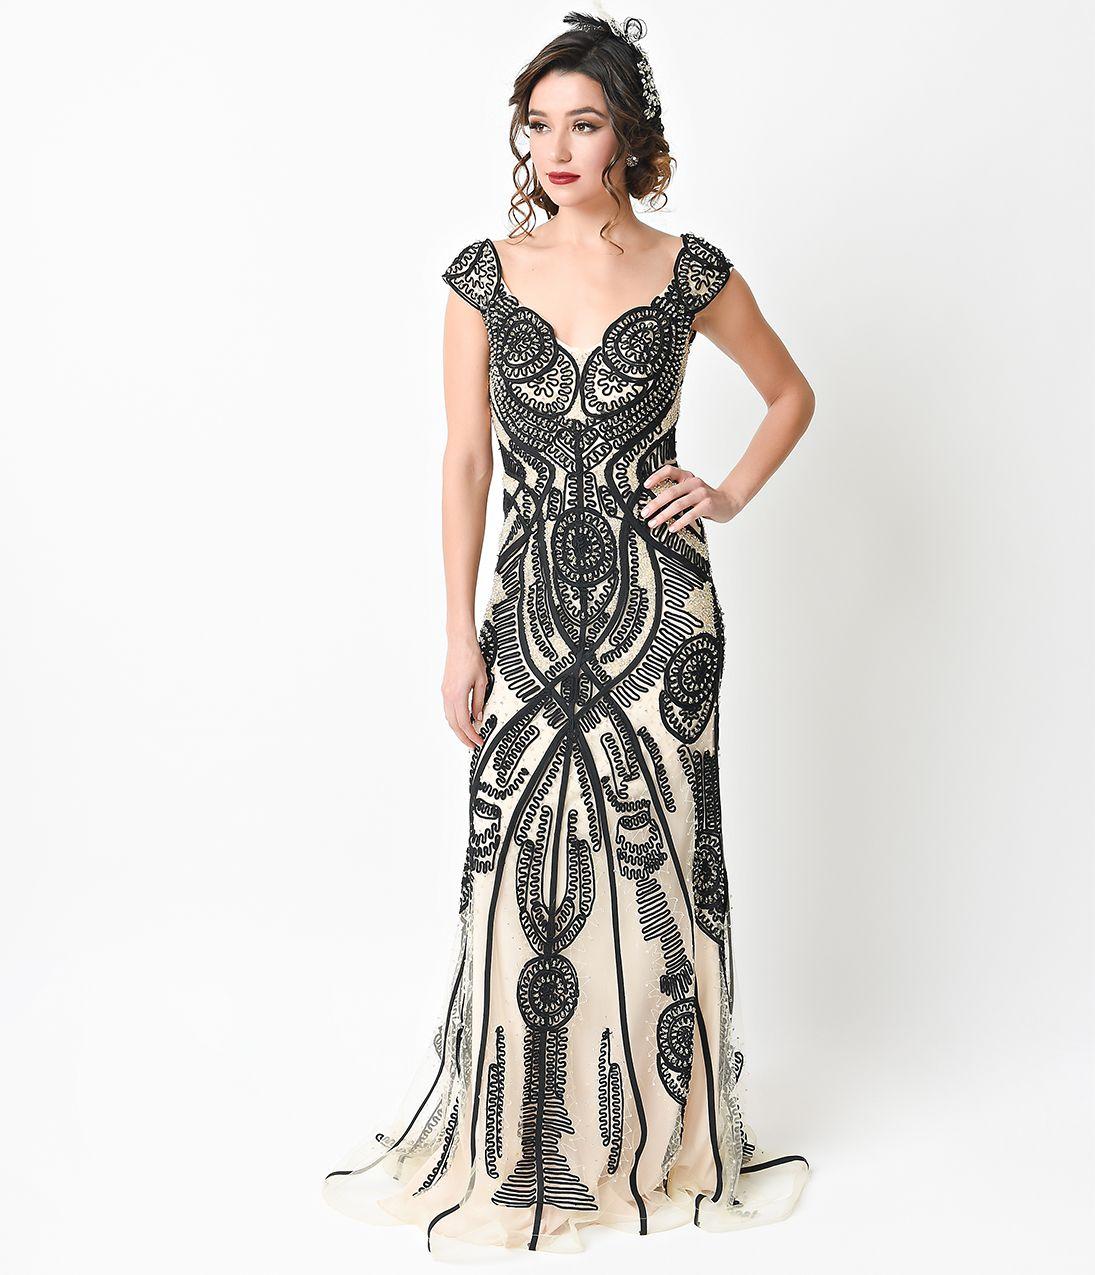 1930s Style Dresses Clothing Unique Prom Dresses 1930s Fashion Evening Gowns [ 1275 x 1095 Pixel ]